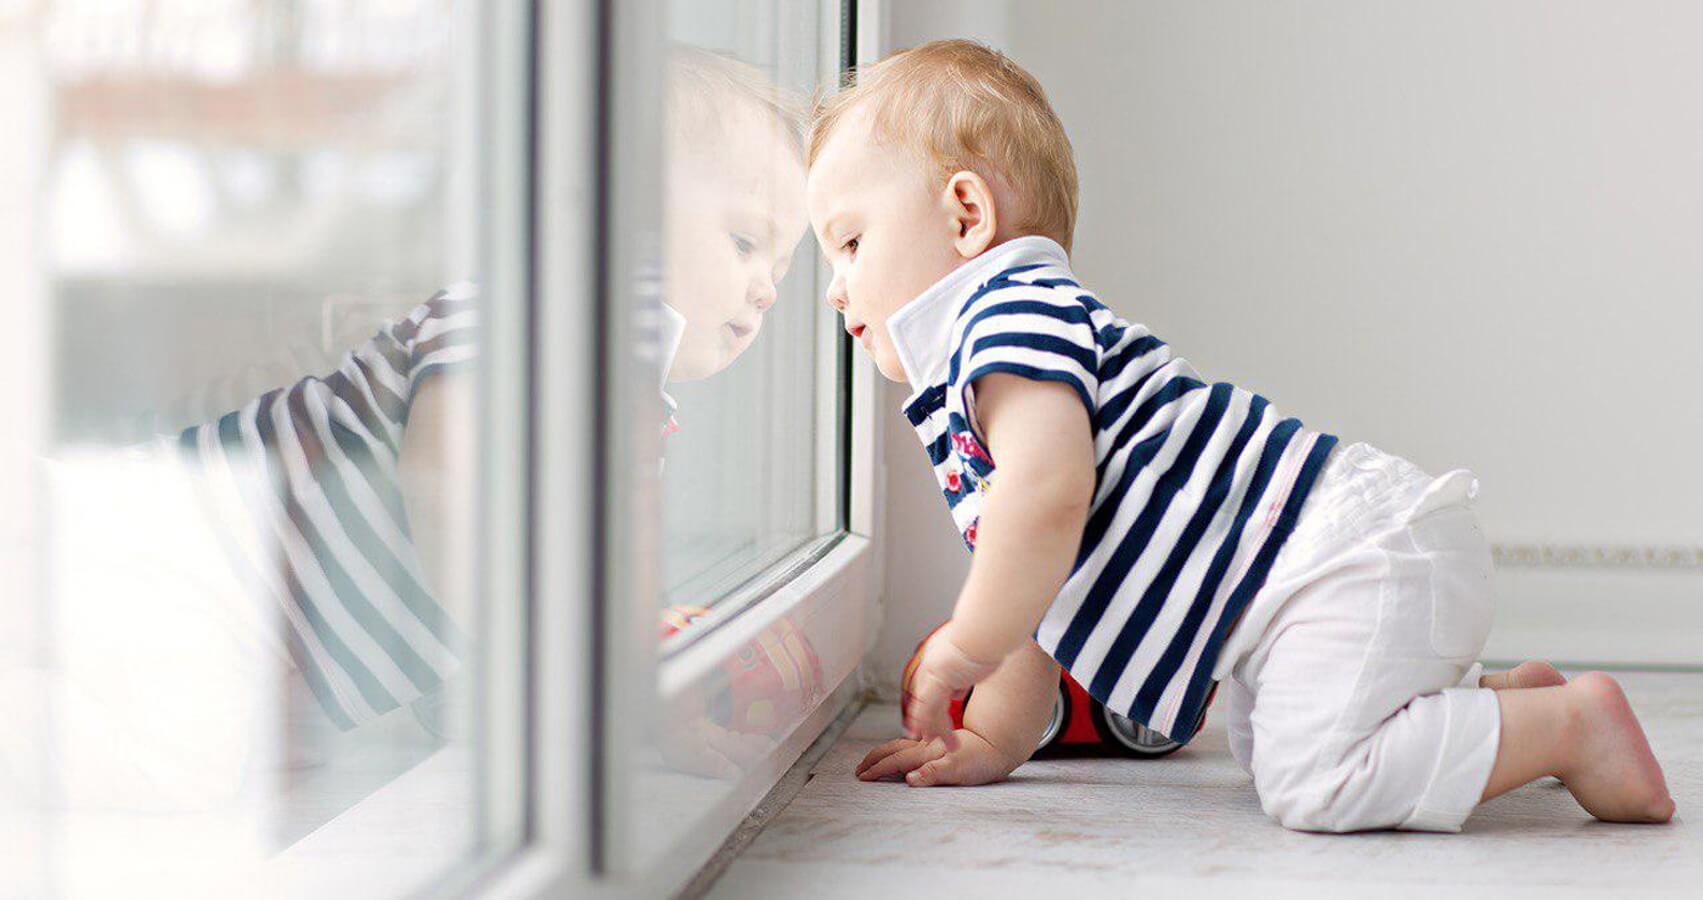 Рекомендации по защите детей от падения из окна